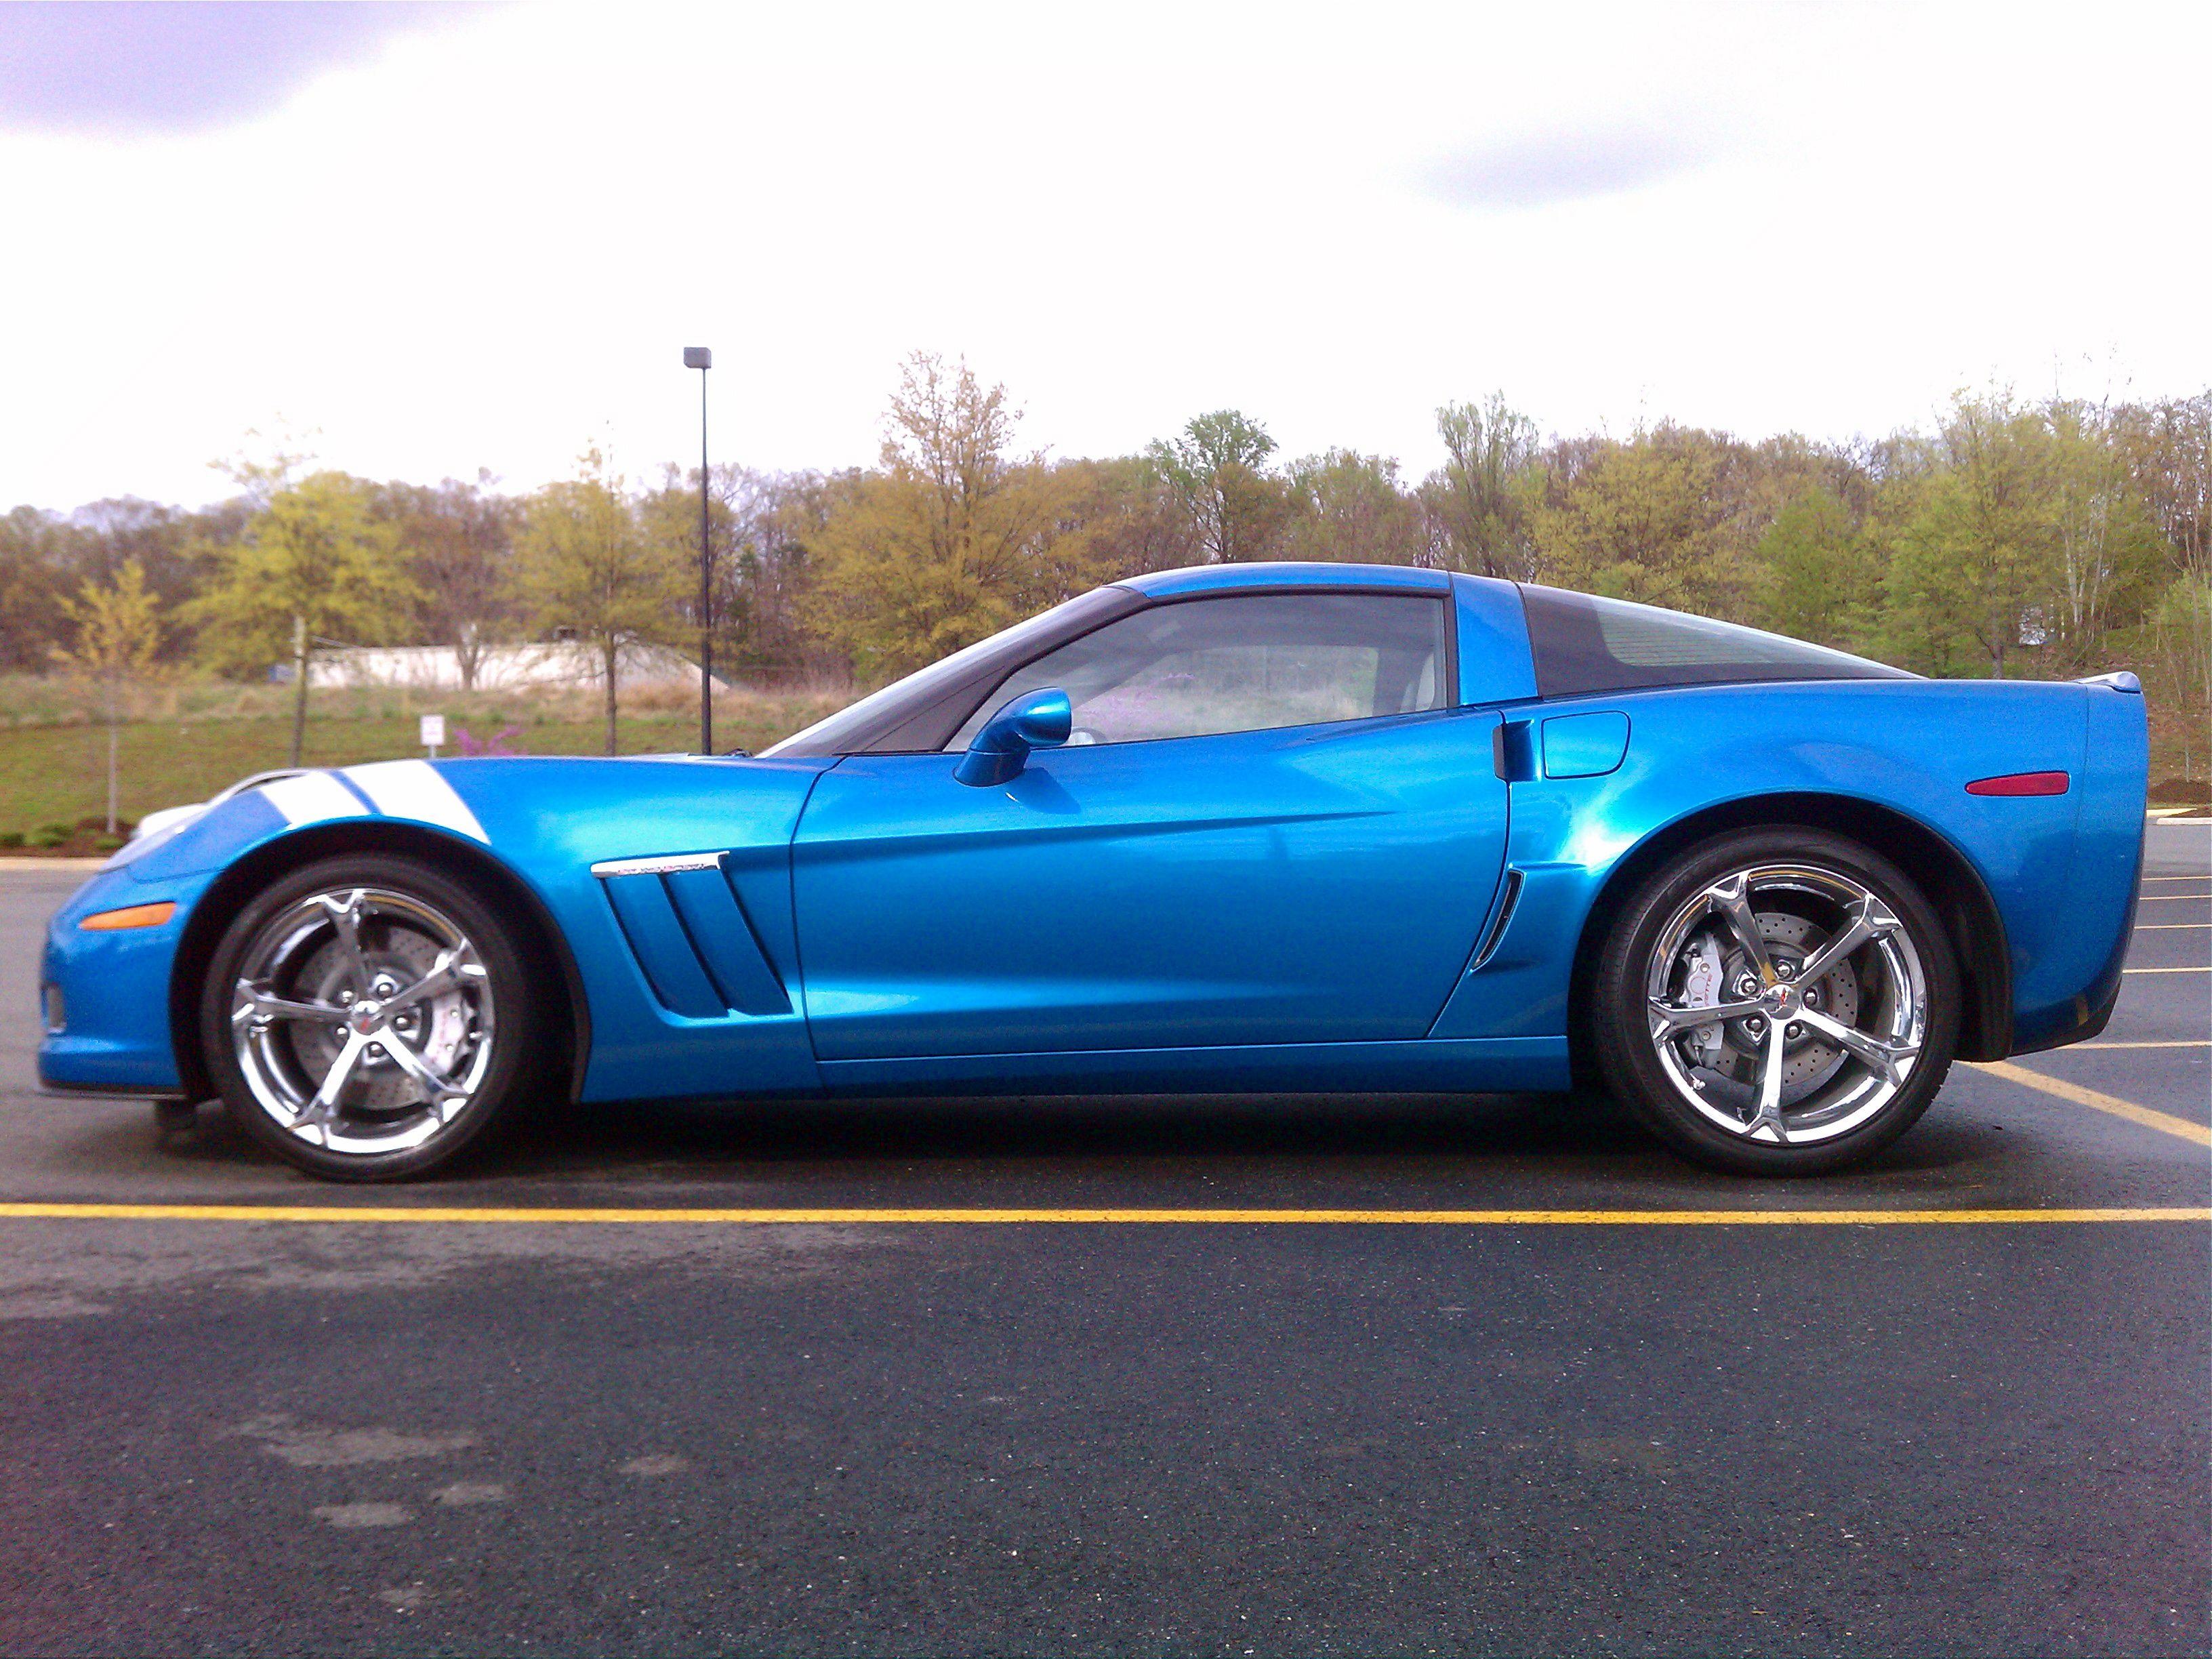 My 2010 Corvette Grand Sport In Jet Stream Blue A Discontinued Color As Of 2011 2010 Corvette Corvette Grand Sport Corvette Summer